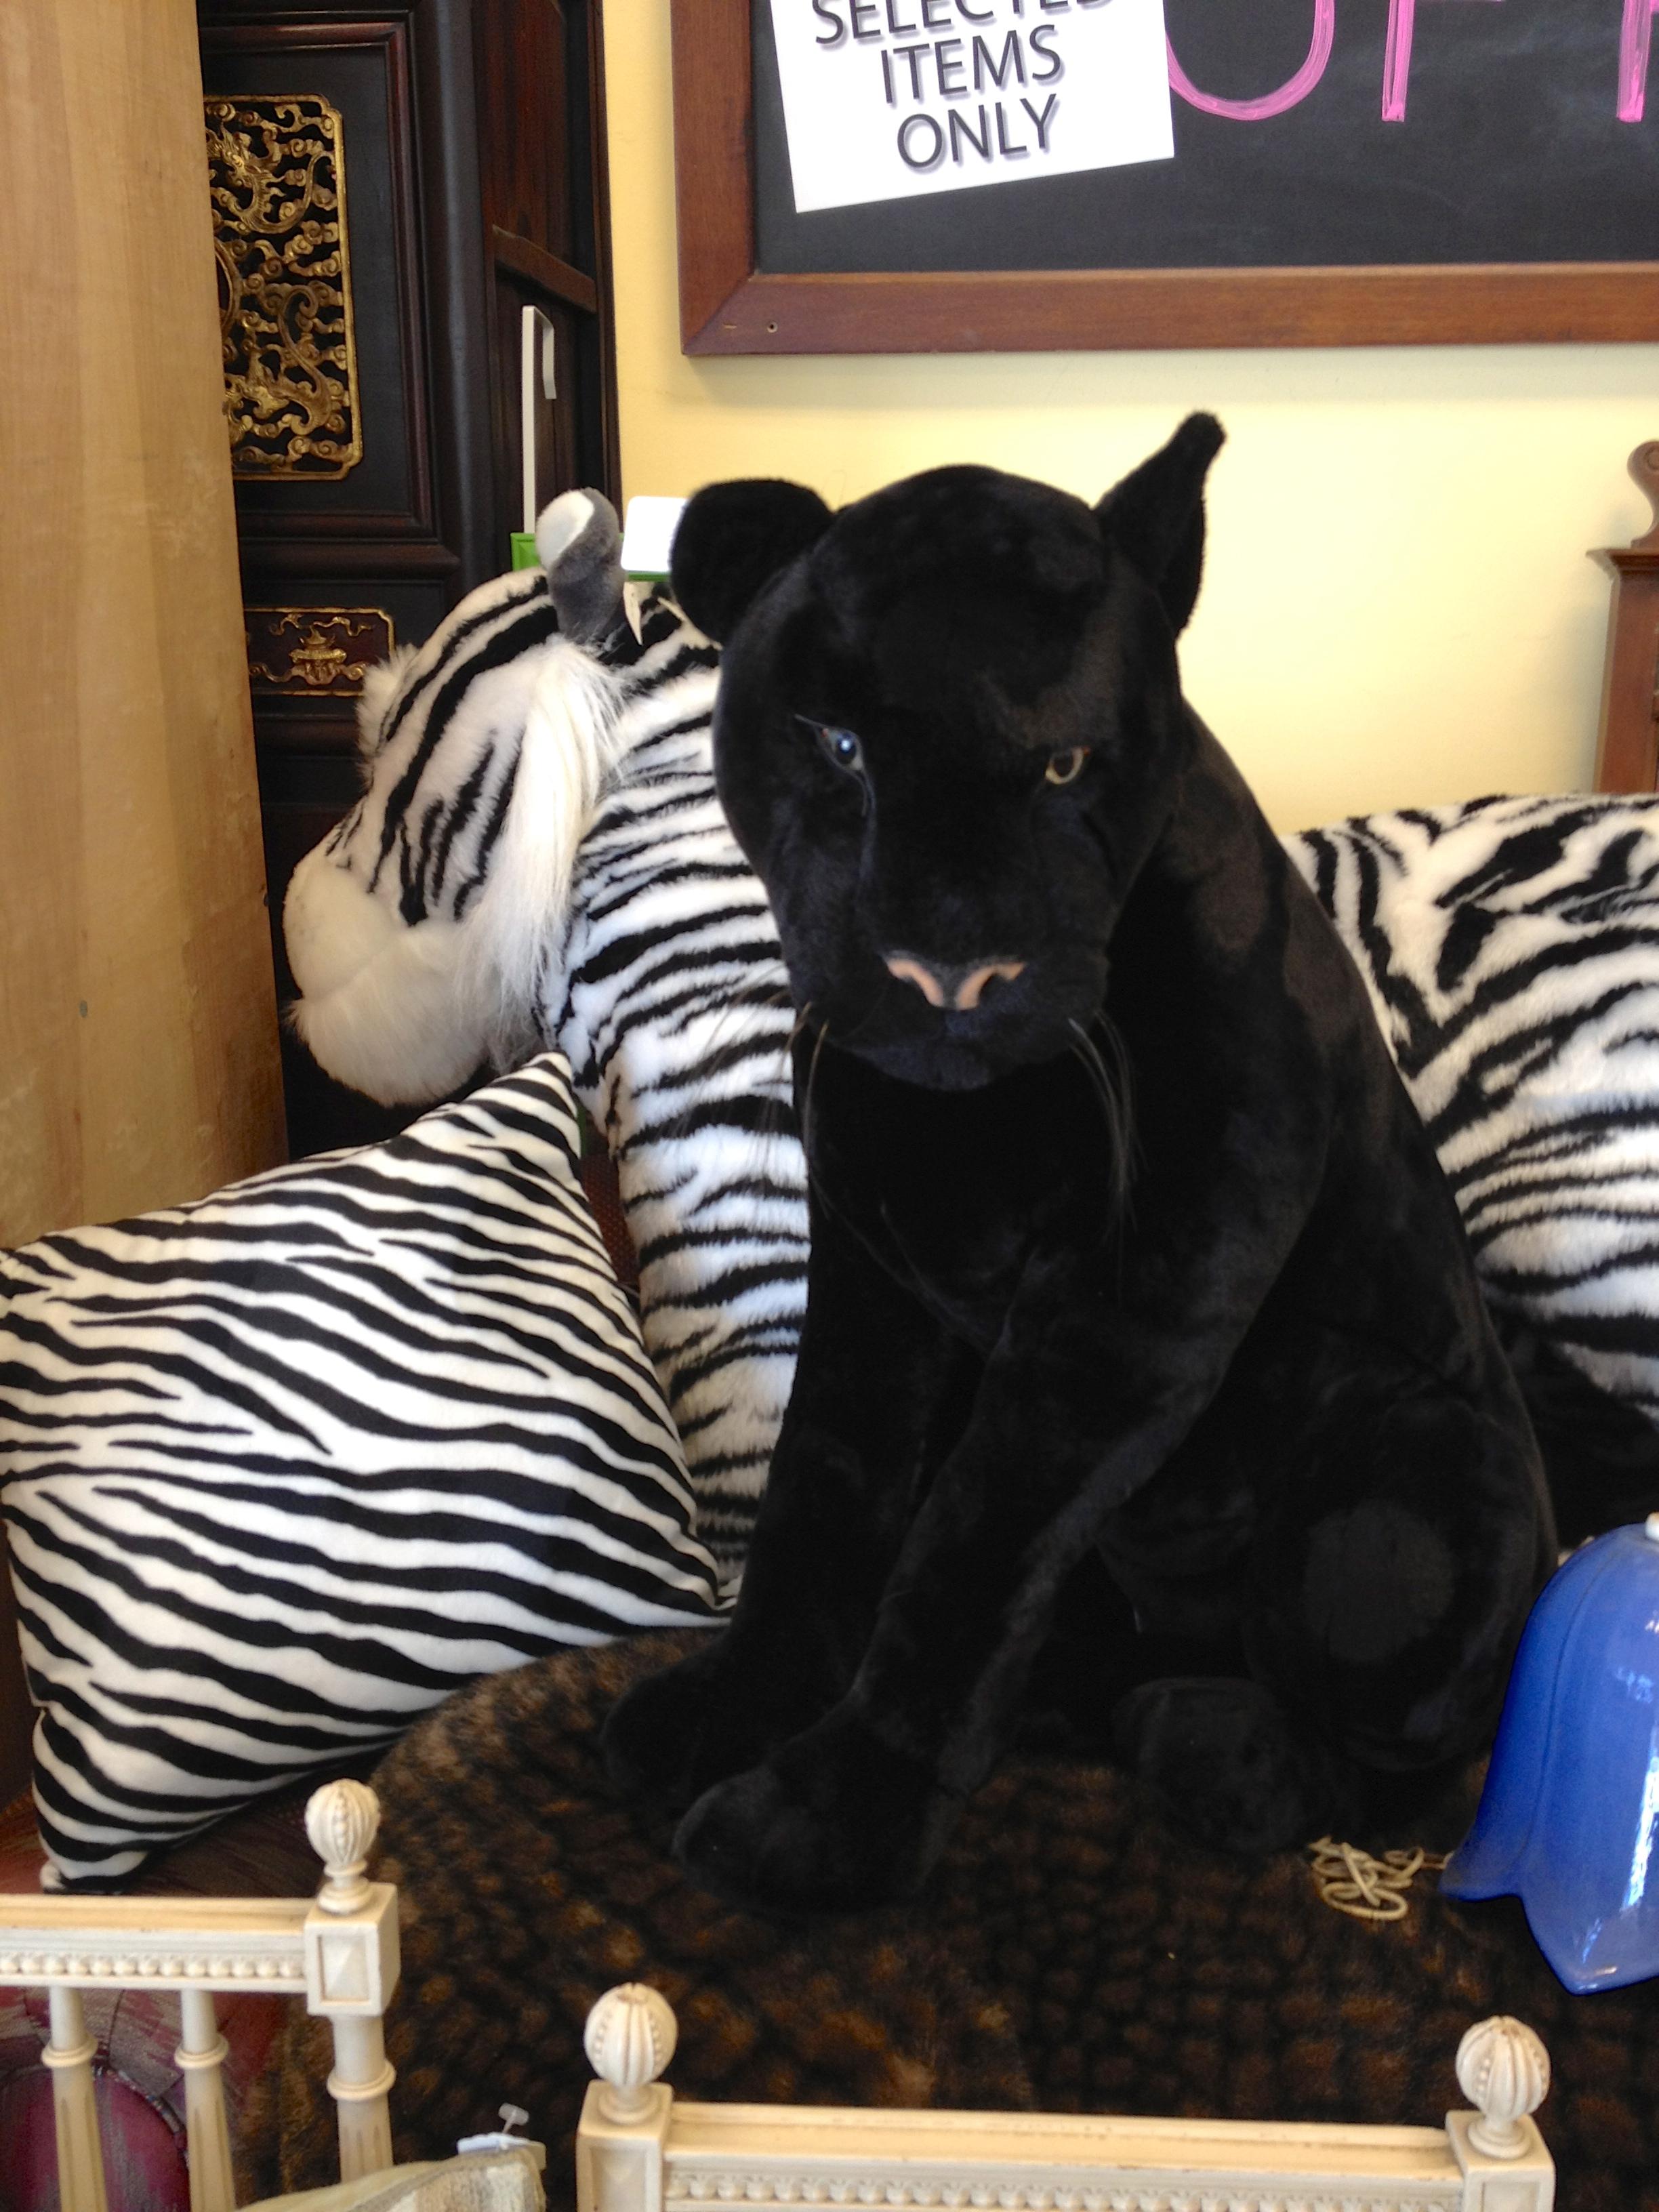 Giant Stuffed Animal Panther